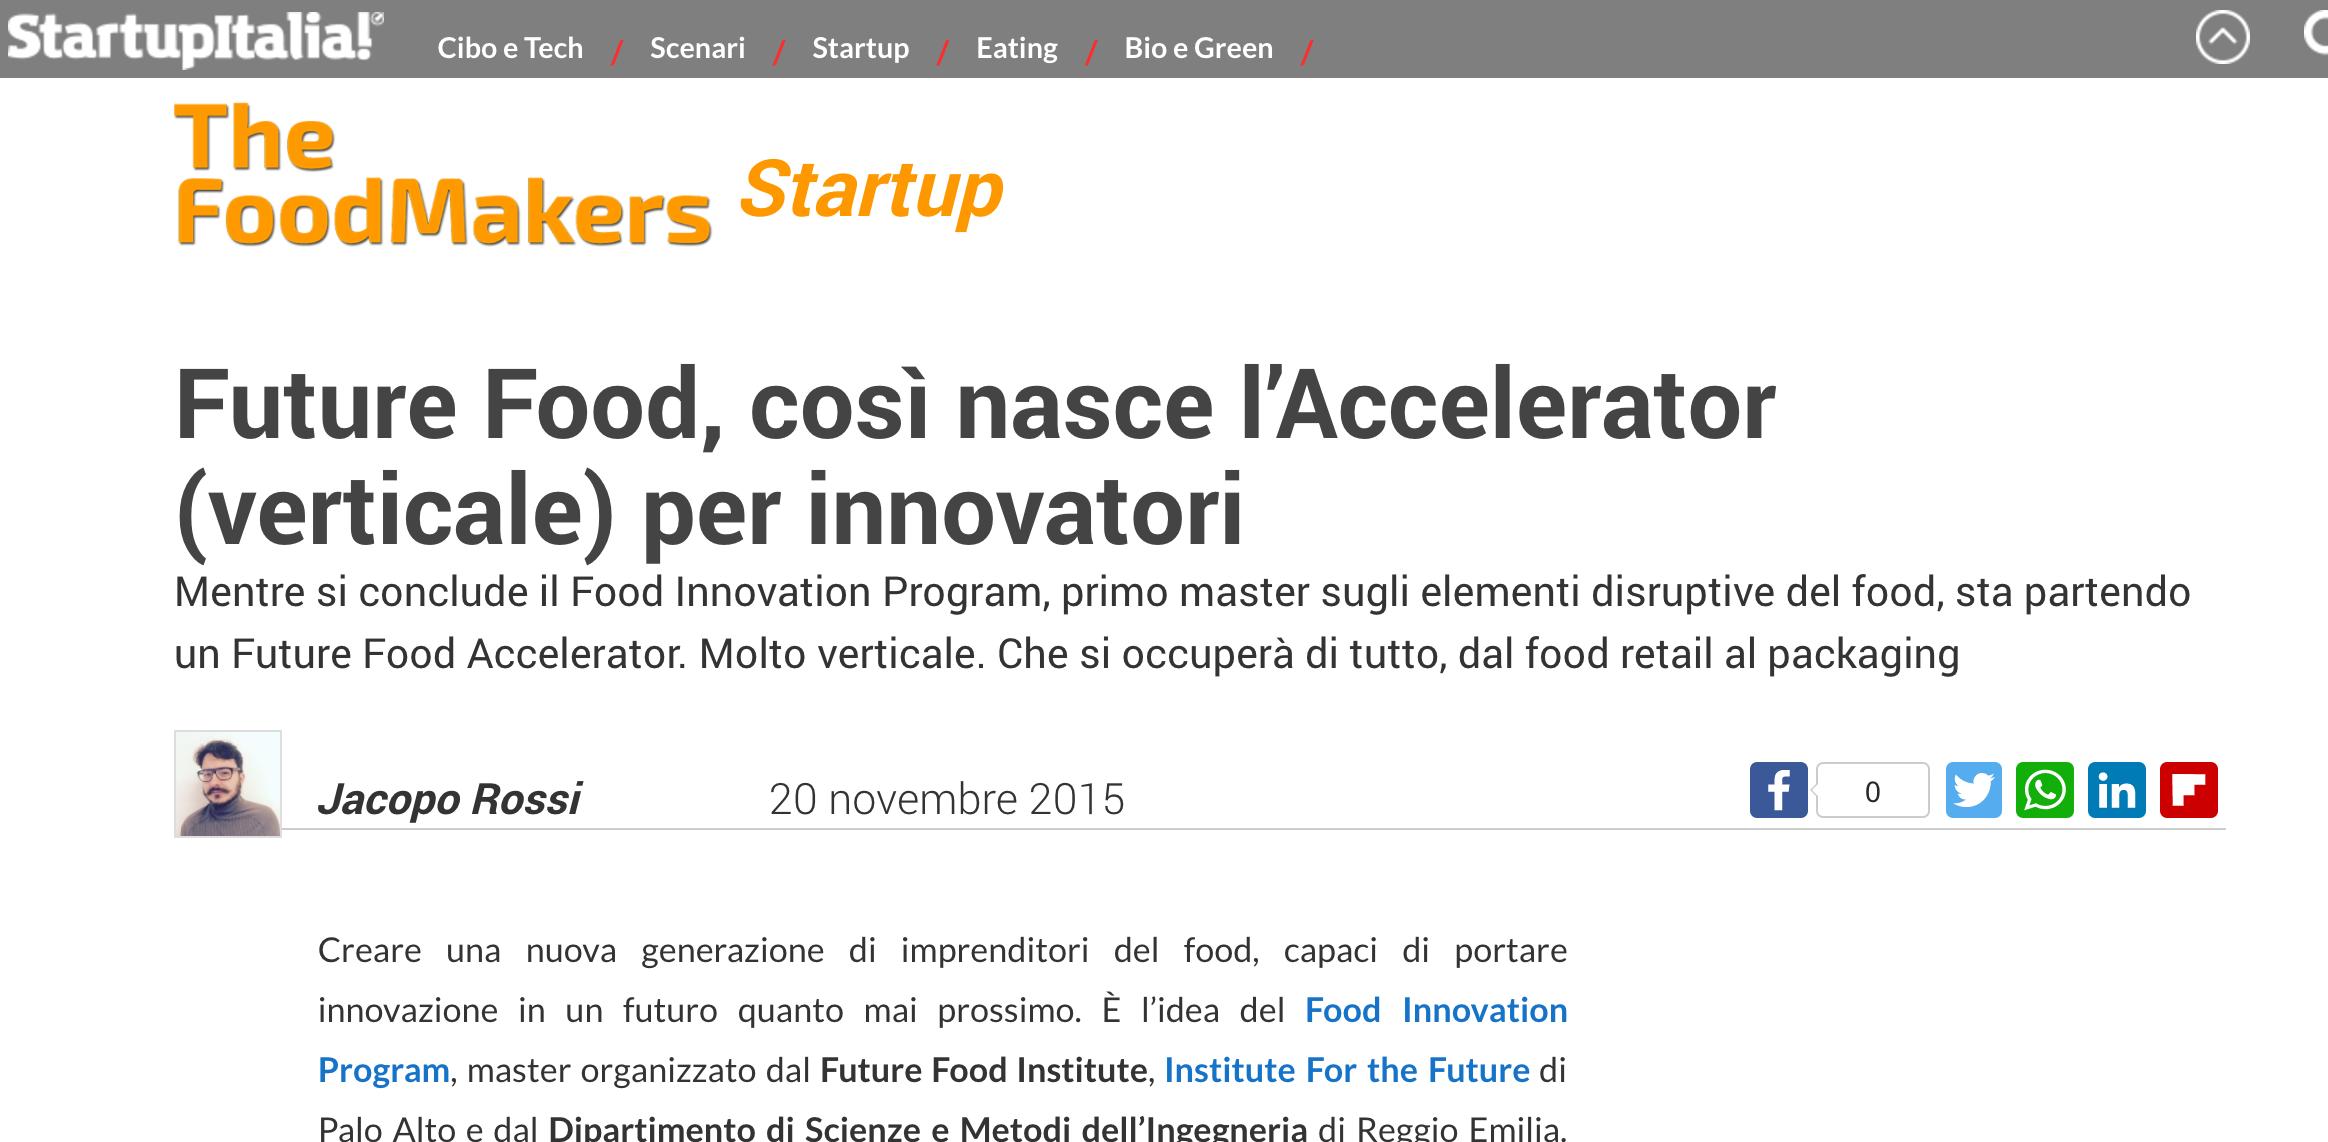 Future Food, così nasce l'Accelerator (verticale) per innovatori - StartupItalia!, November 2015